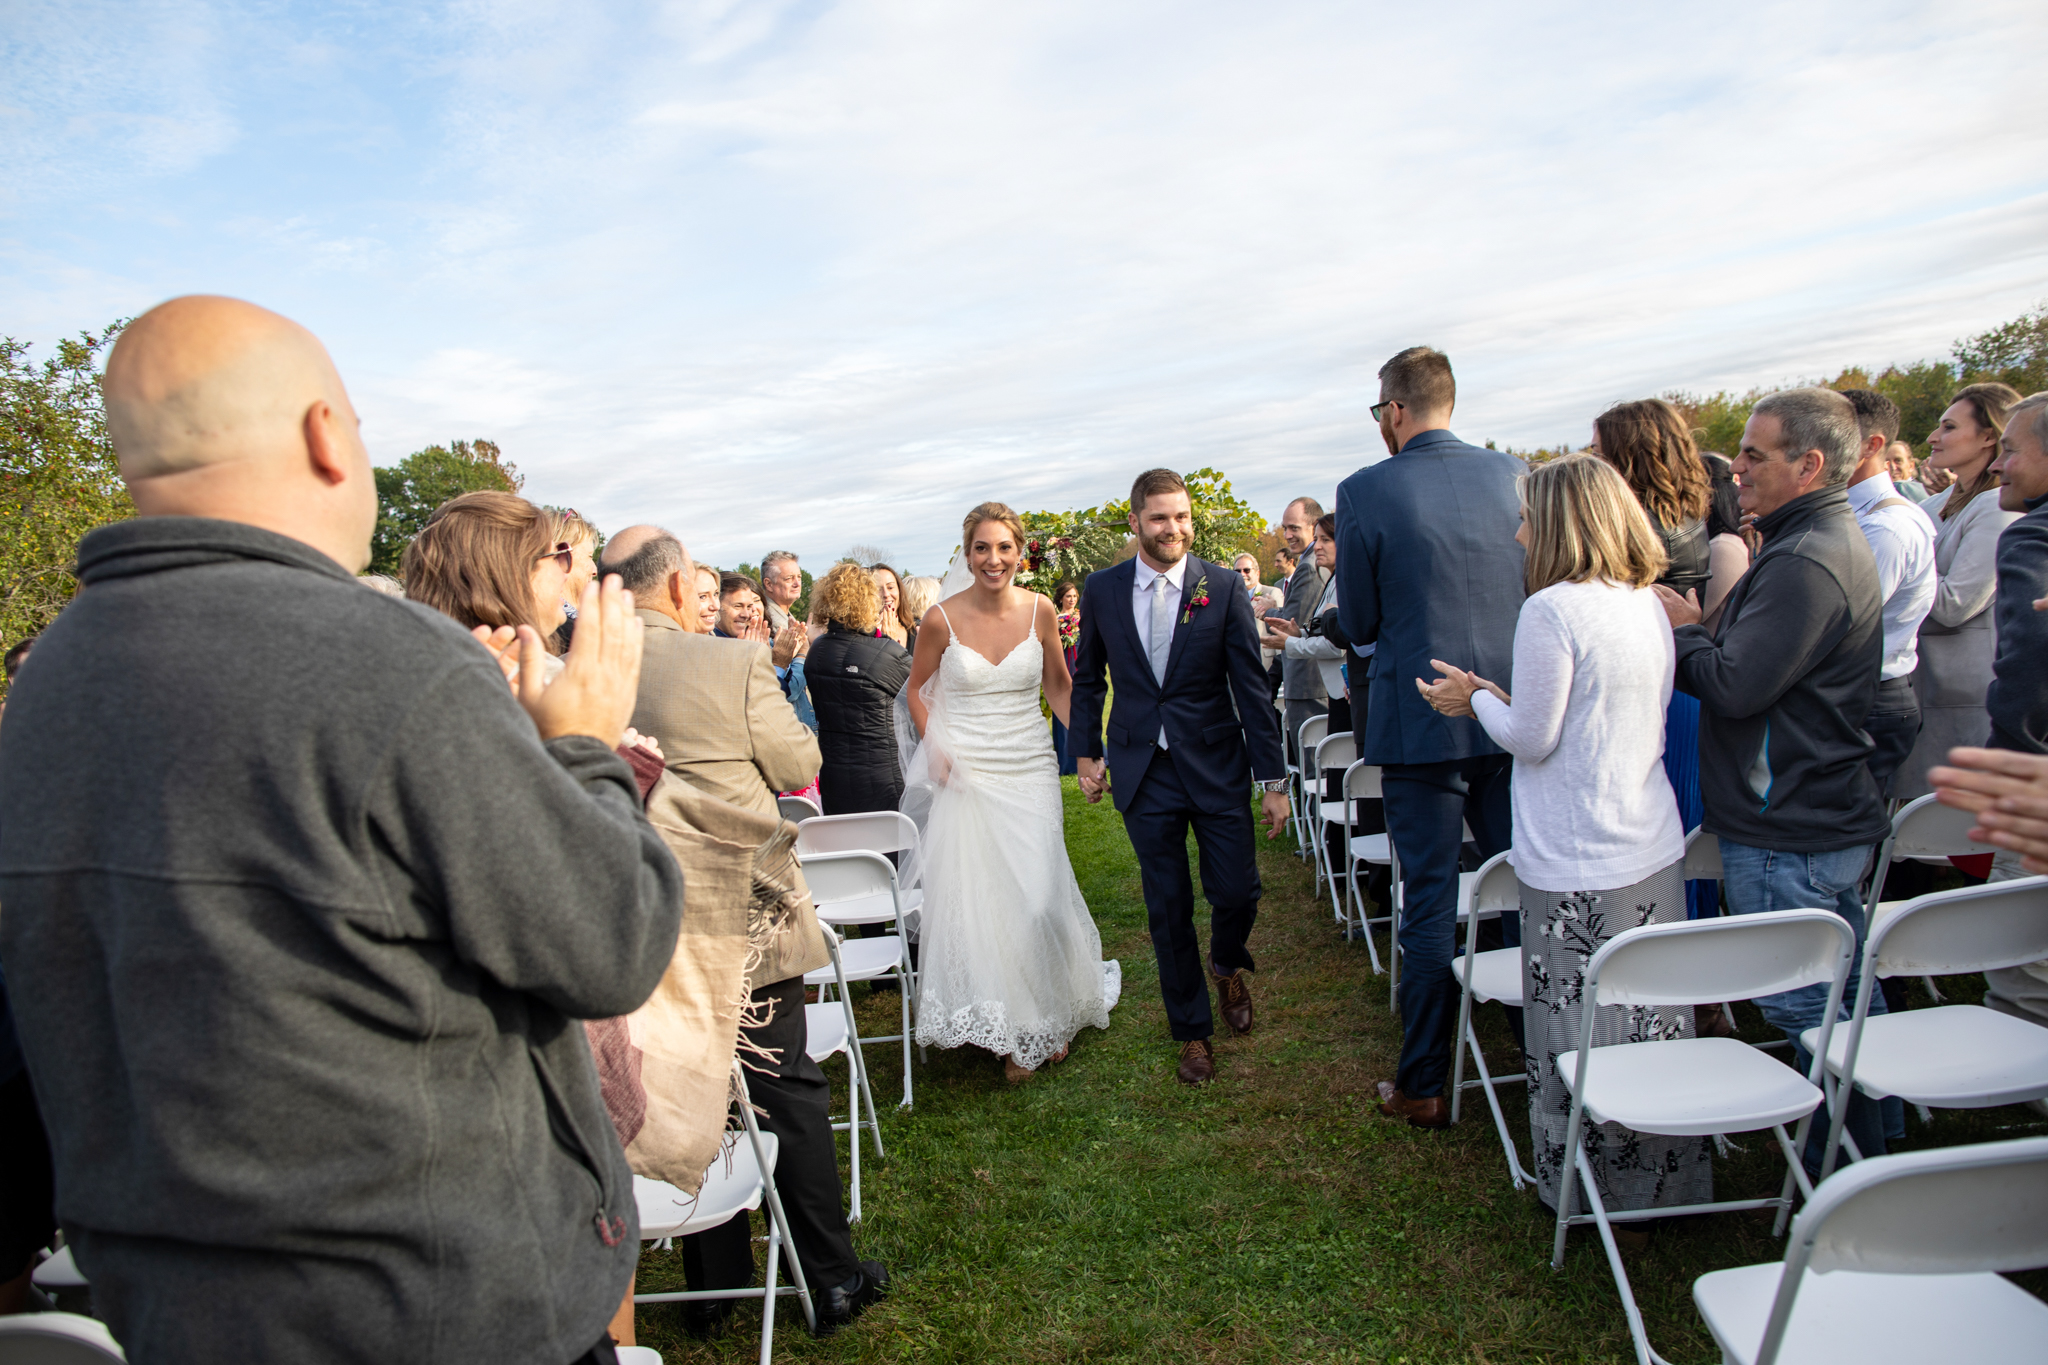 maine-farm-wedding-photographer-stepheneycollins-148.jpg